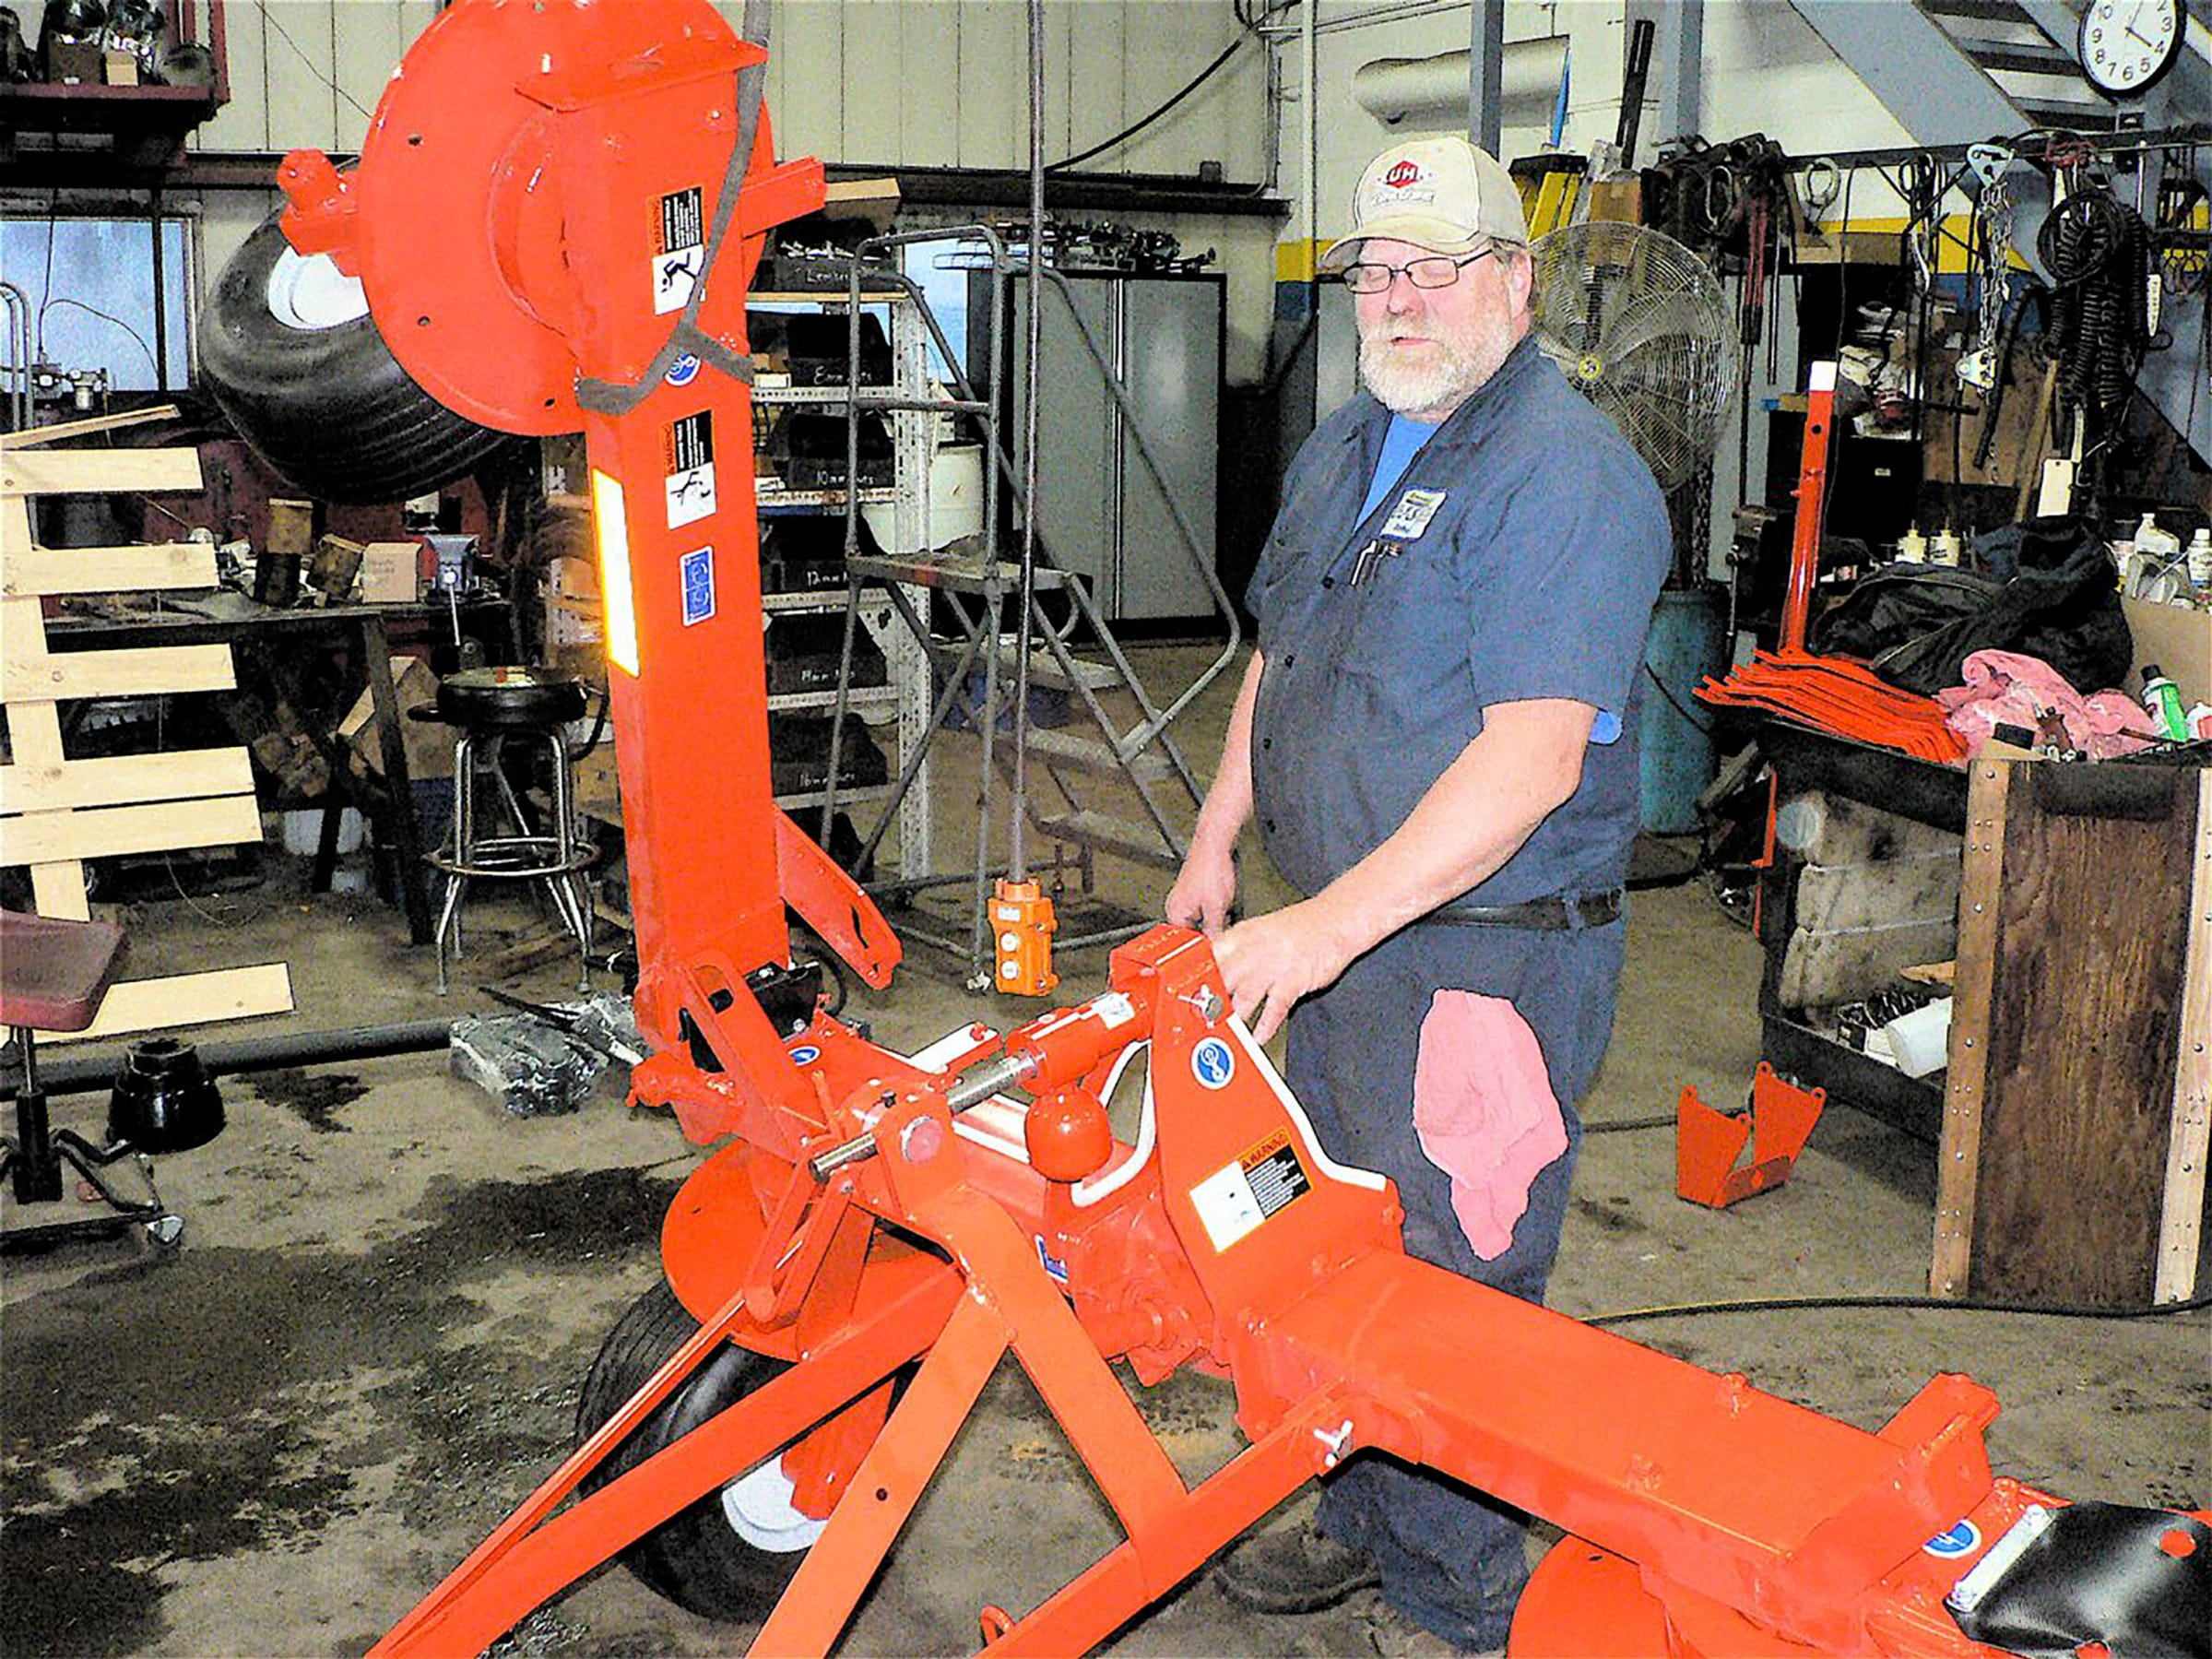 John Pomerenke assembles a hay tool.